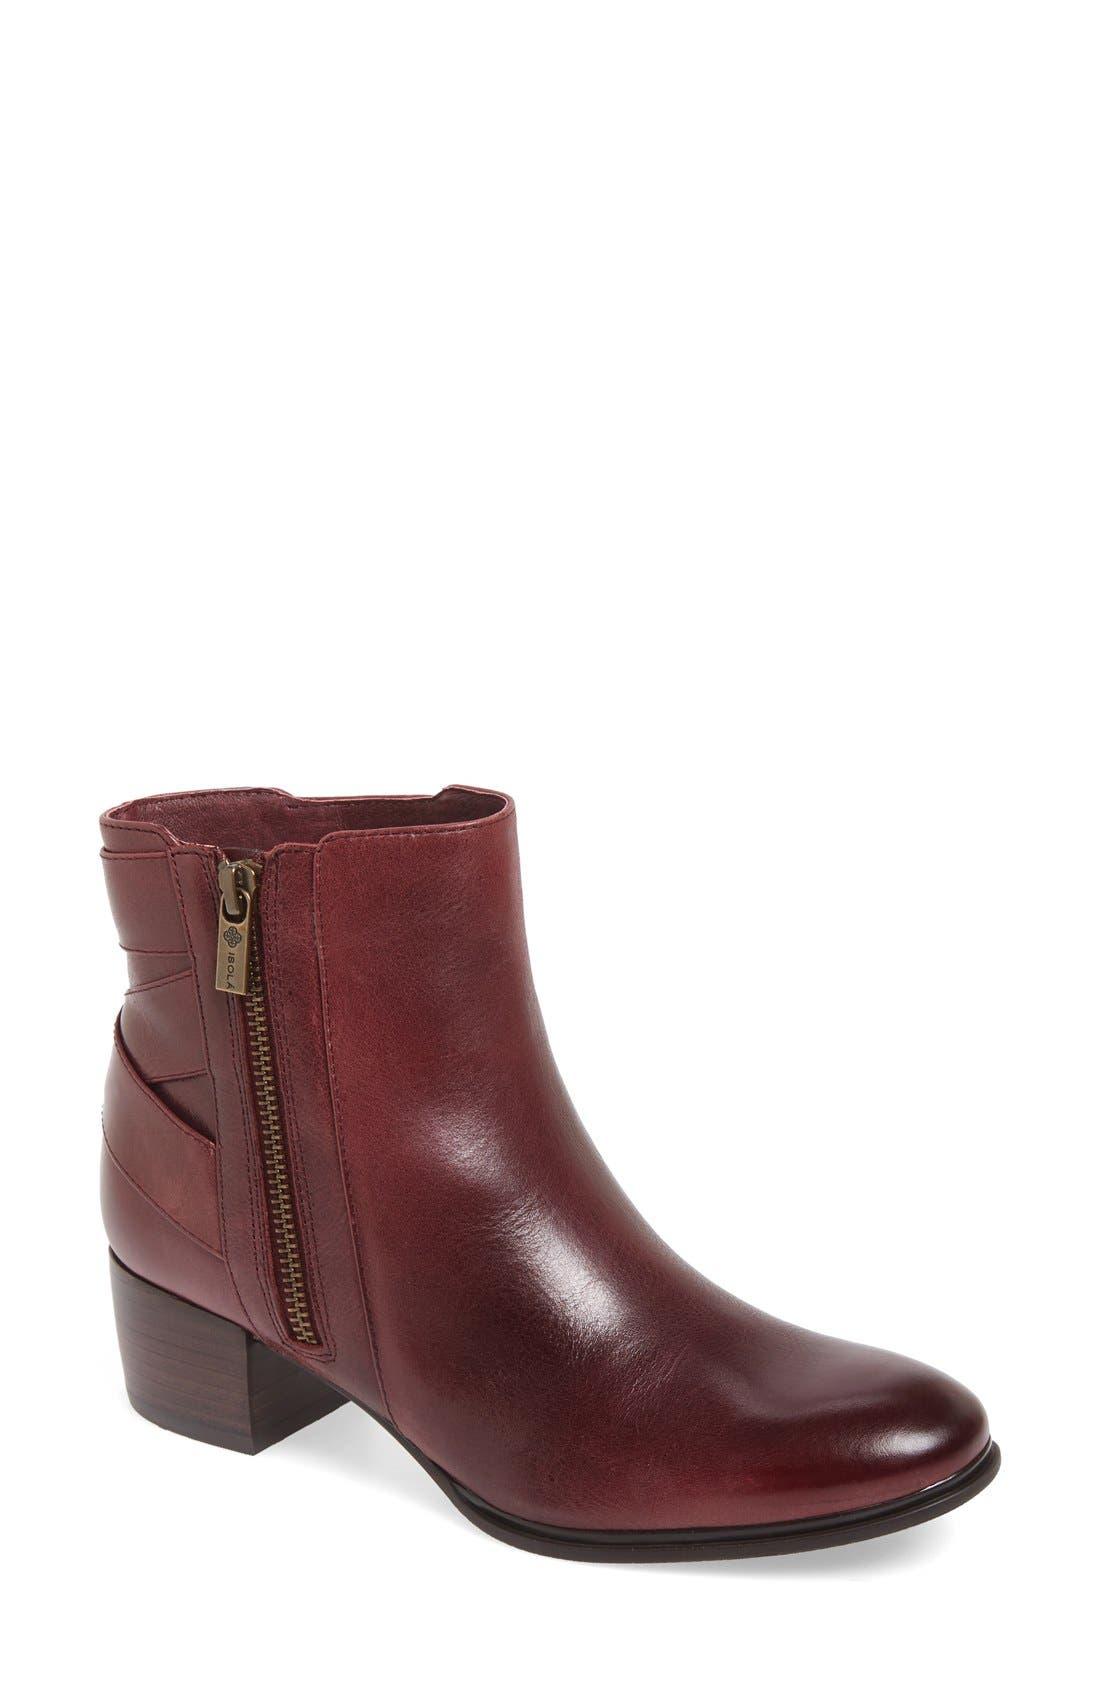 'Delta' Bootie,                             Main thumbnail 1, color,                             Burgundy Leather